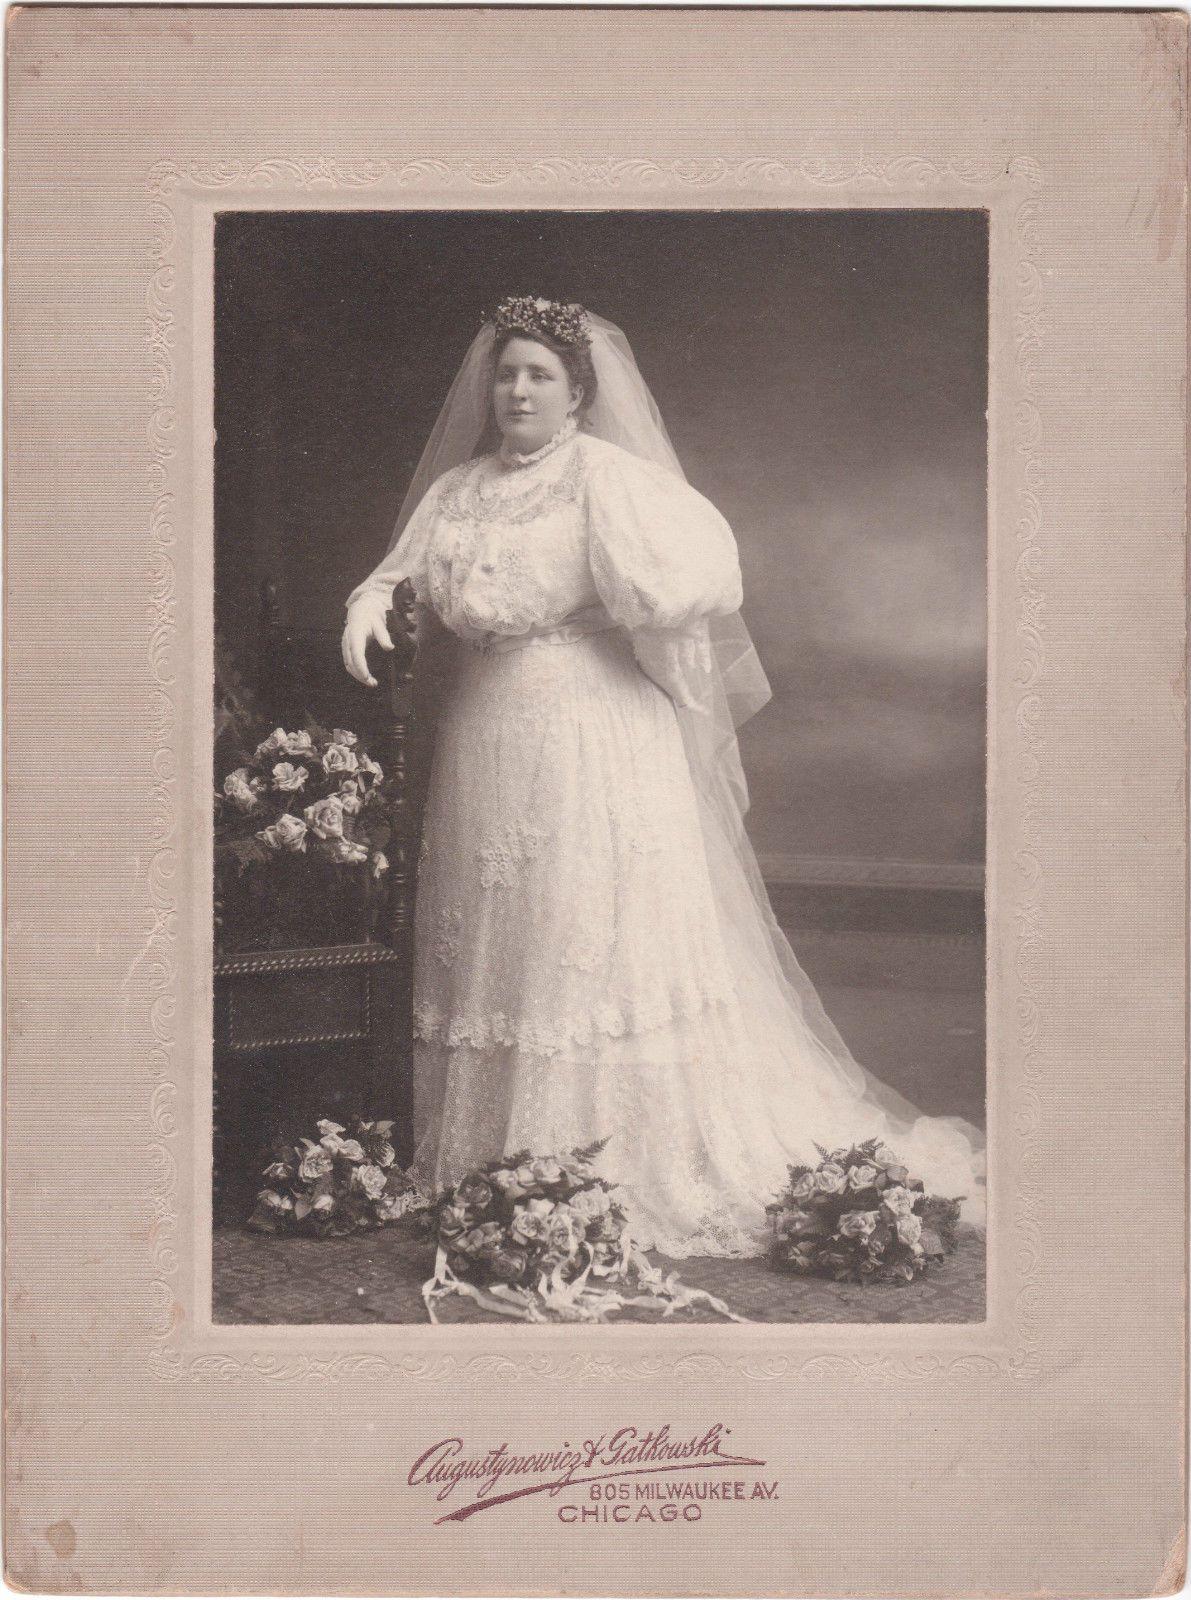 C 1900 Photoi/Opulent Bride Amidst Bouquets Of Roses/ Chicago/Wedding Dress